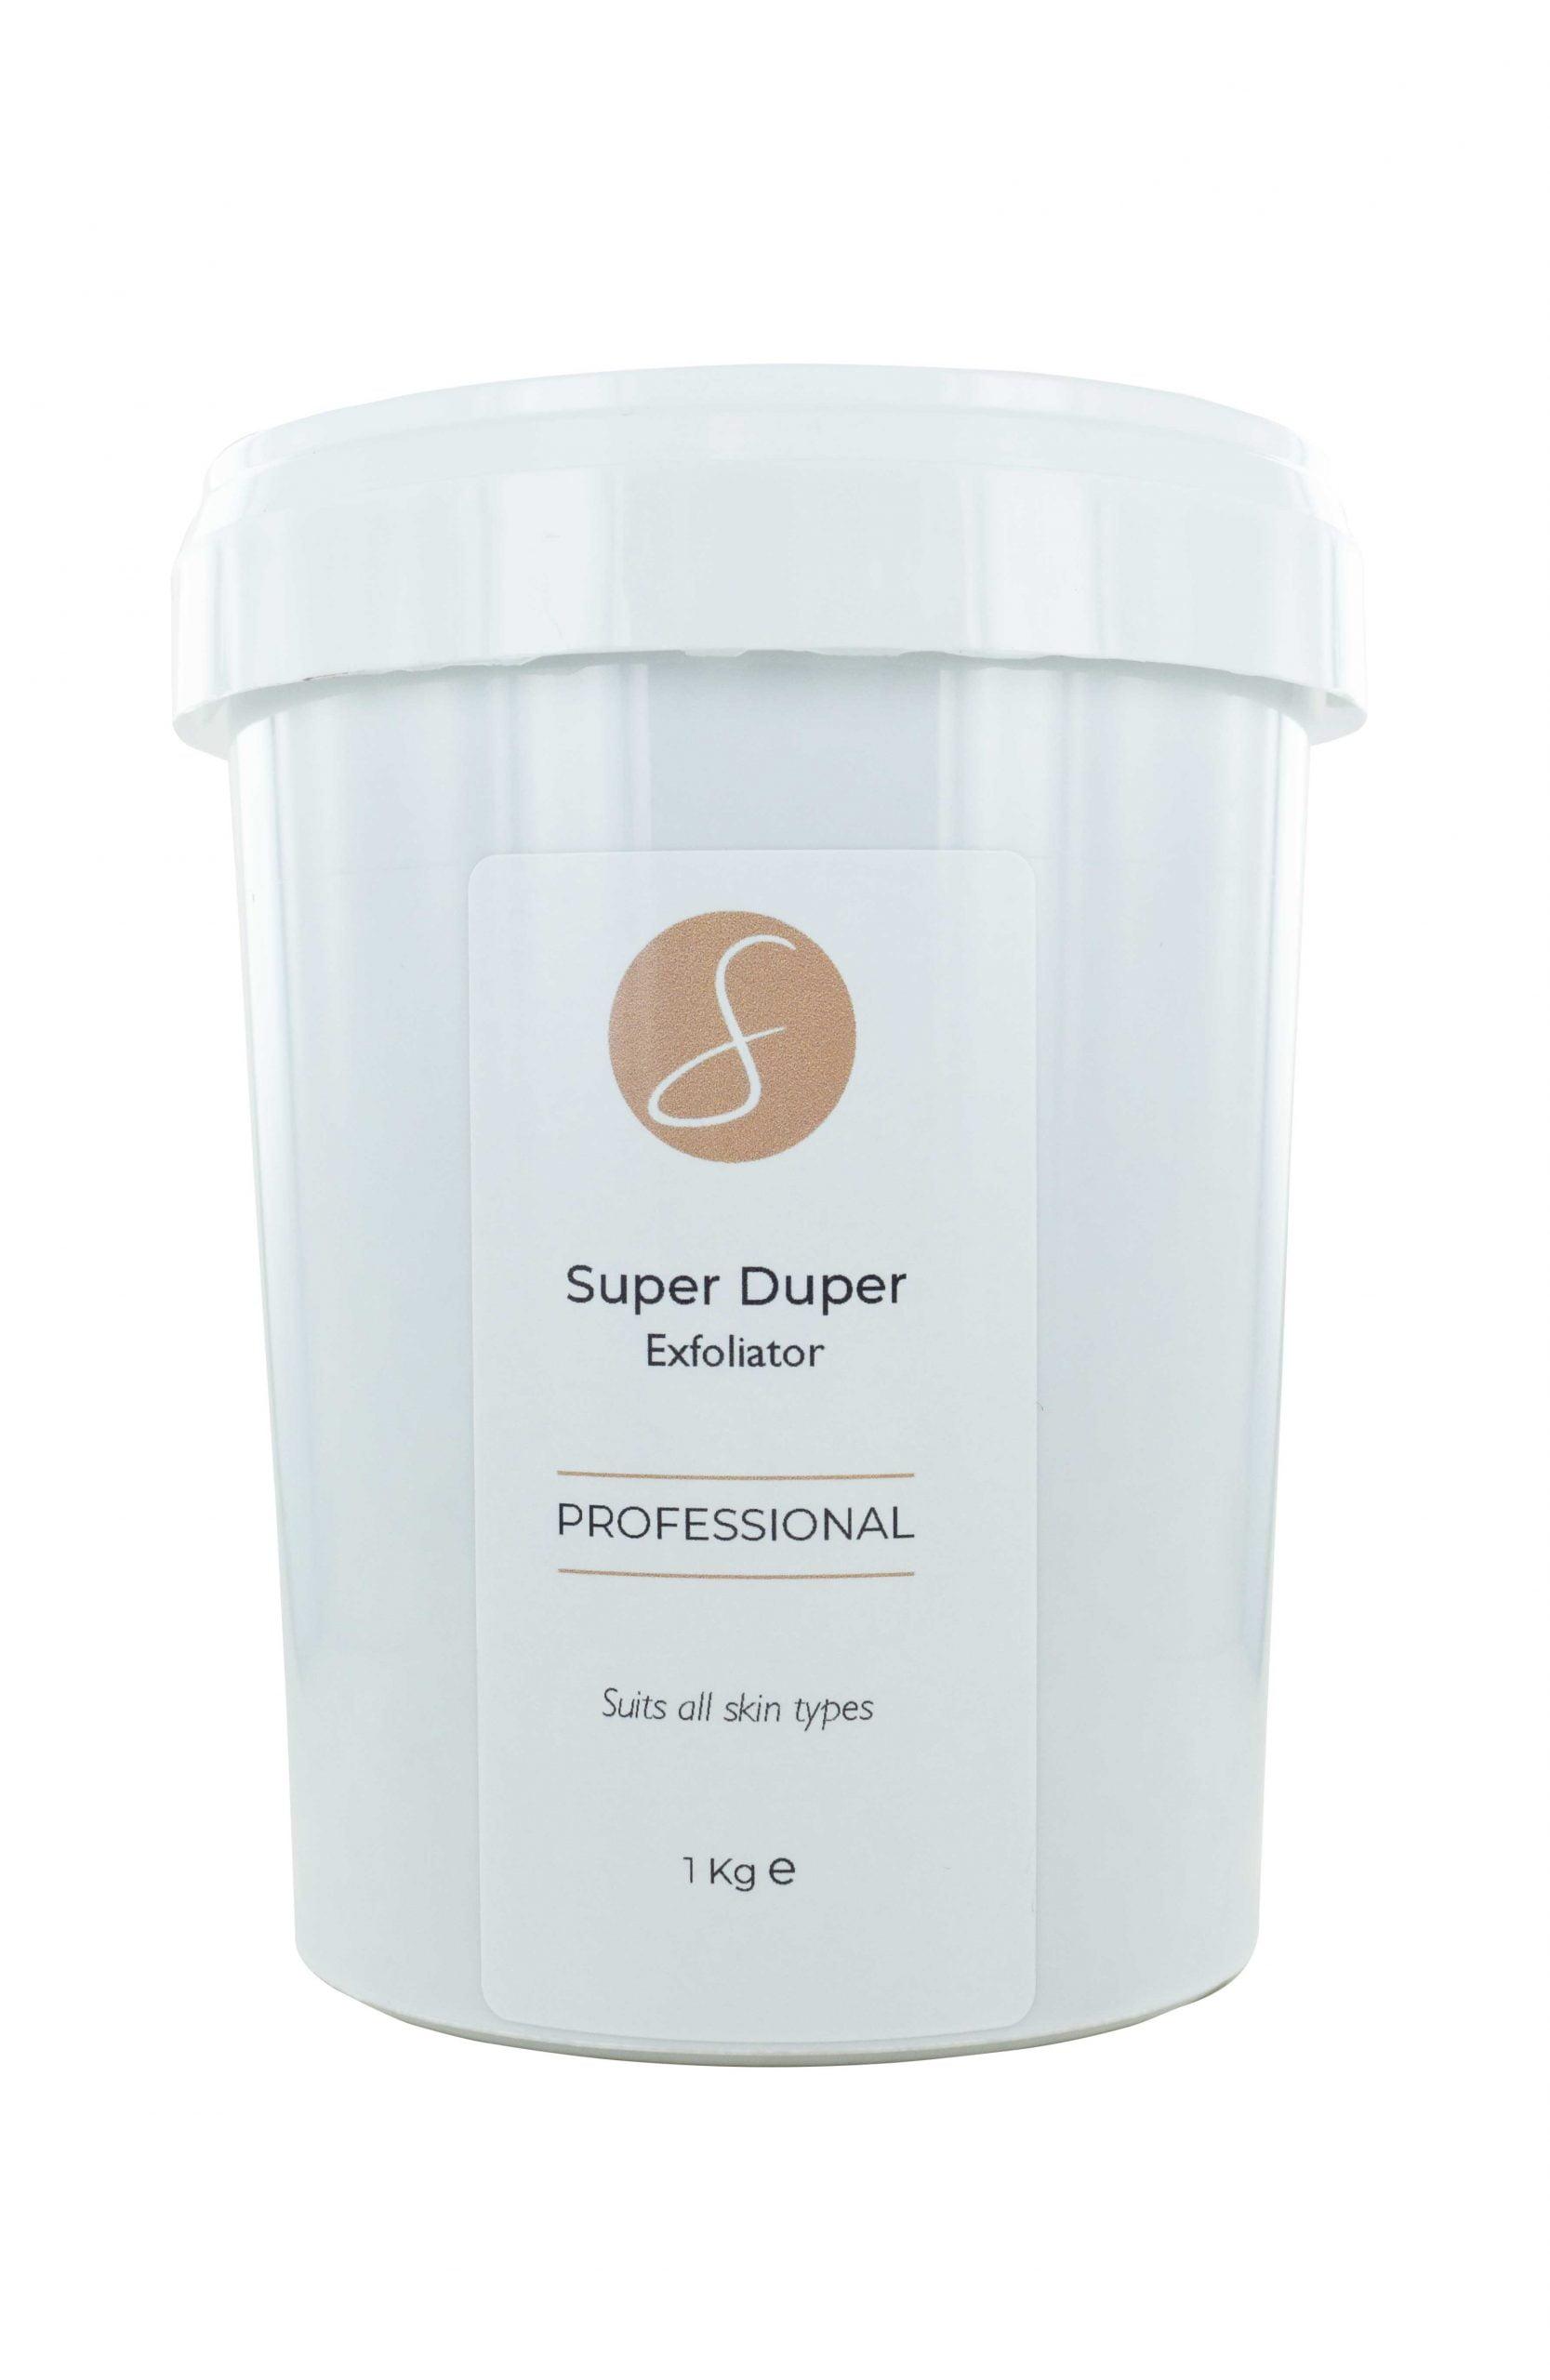 Super Duper Exfoliator